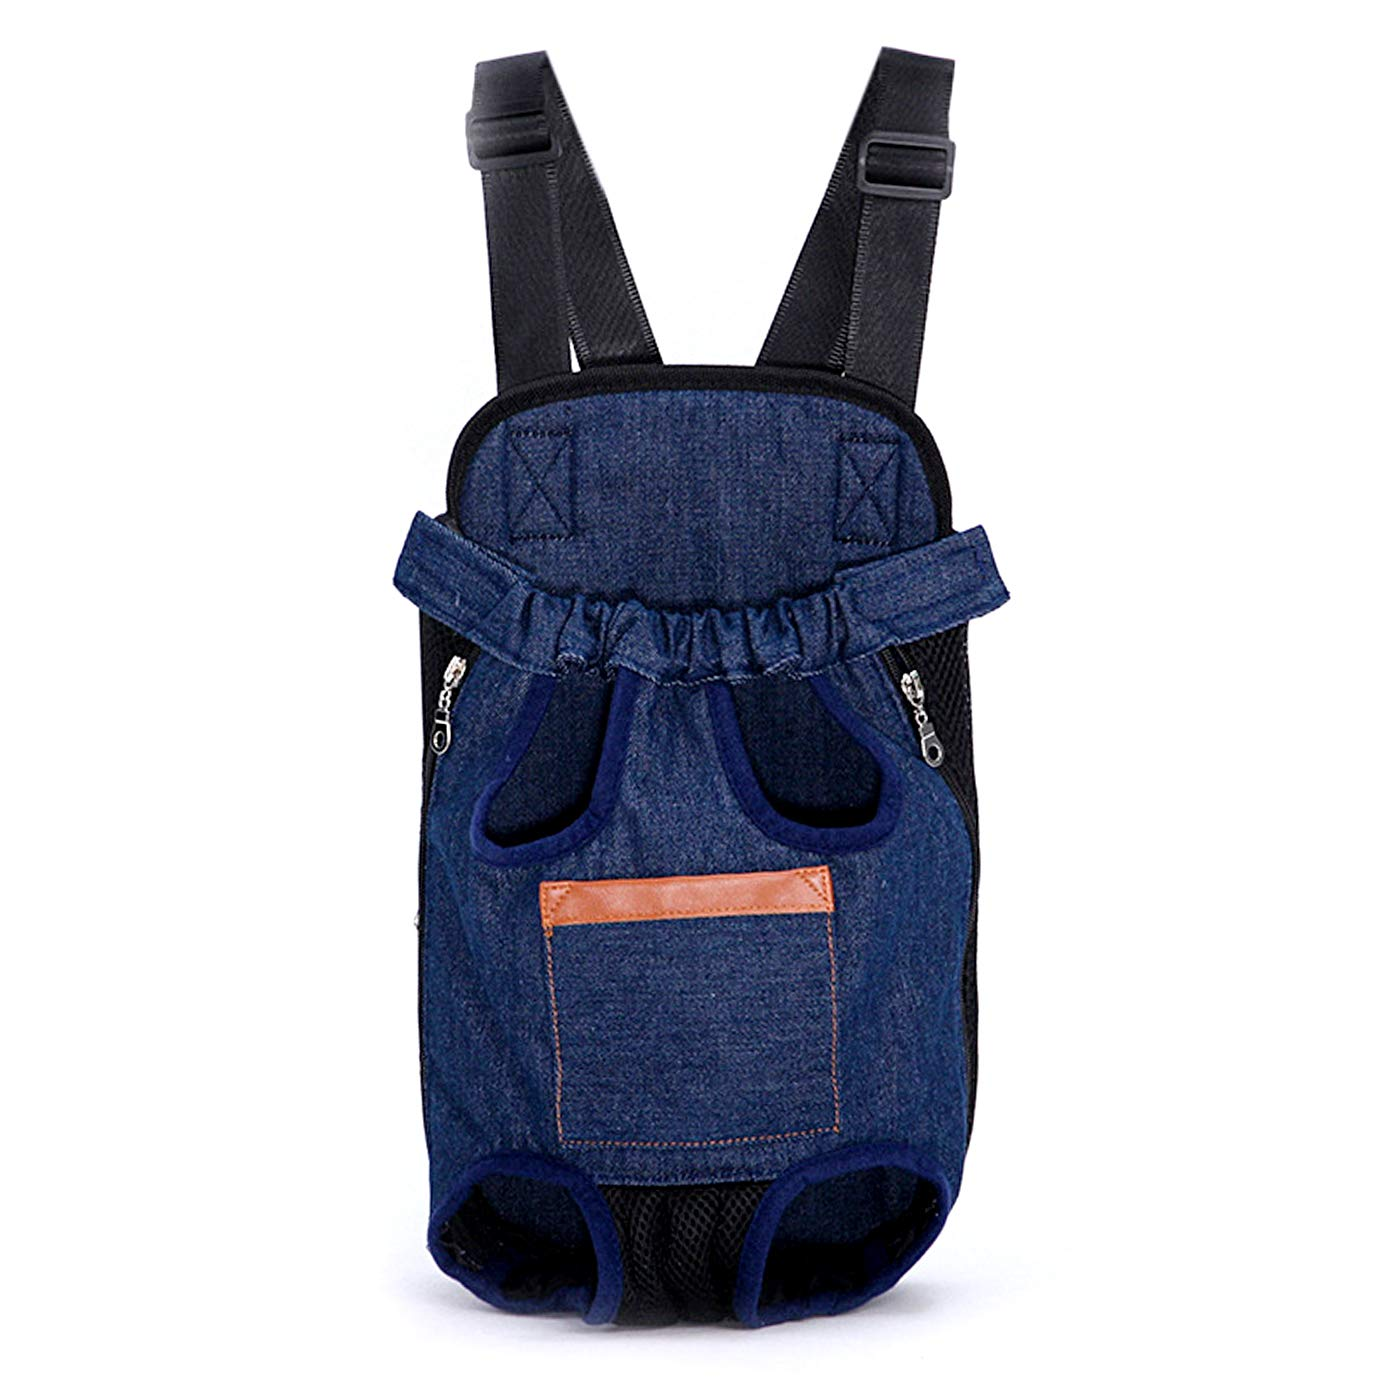 Denim XL Denim XL Alfie Pet Aubrey Pet Backpack or Front Carrier with Adjustable Strap color  Denim, Size  XL